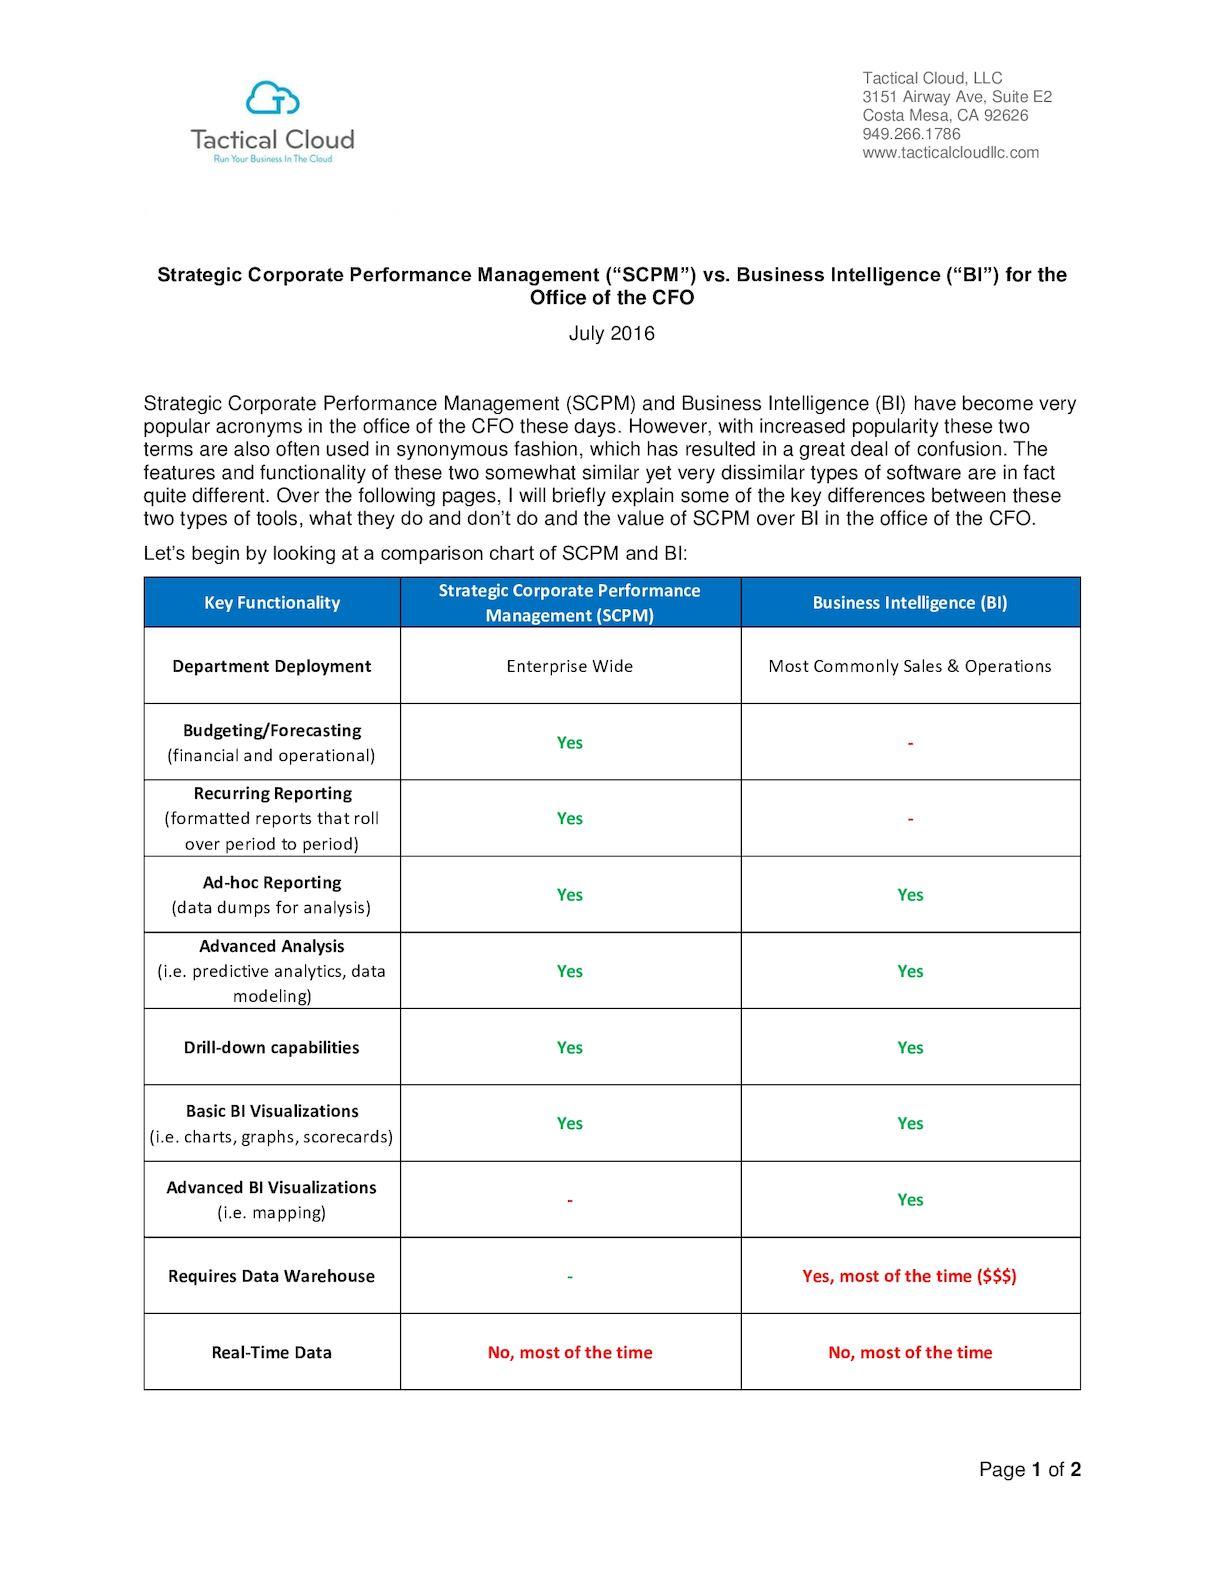 Calaméo - Corporate Performance Management Vs Business